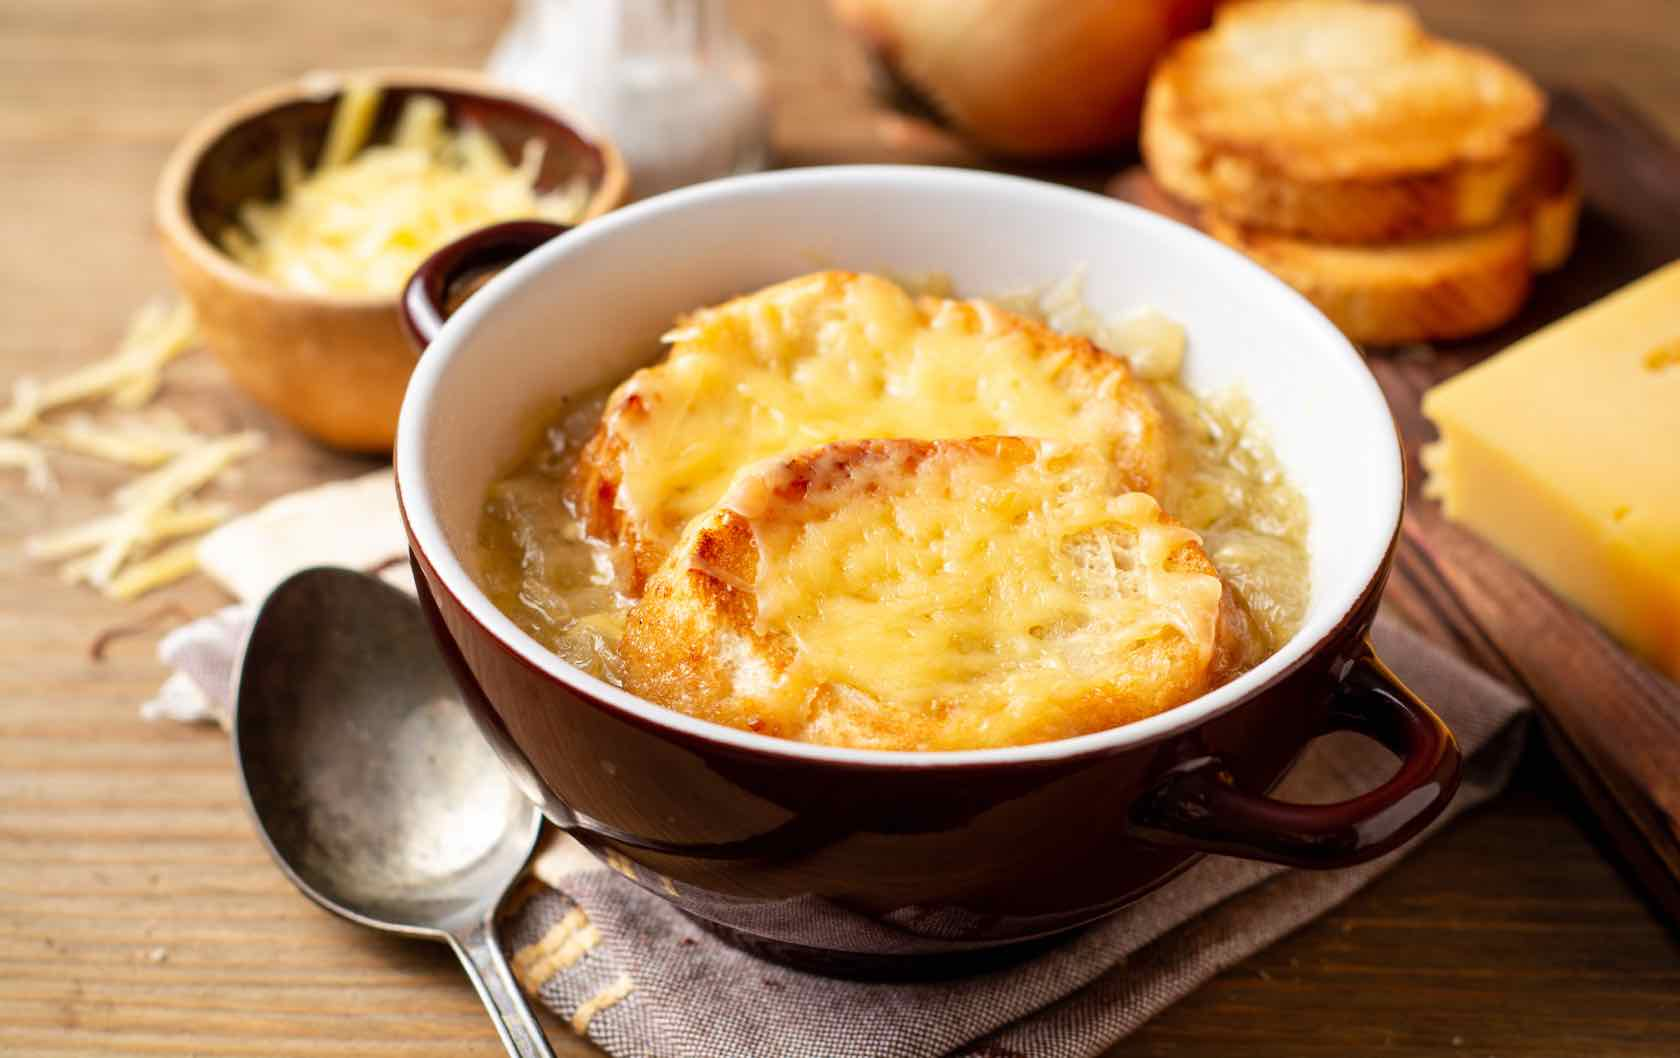 Classic Savory French Dishes Soupe à l'Oignon